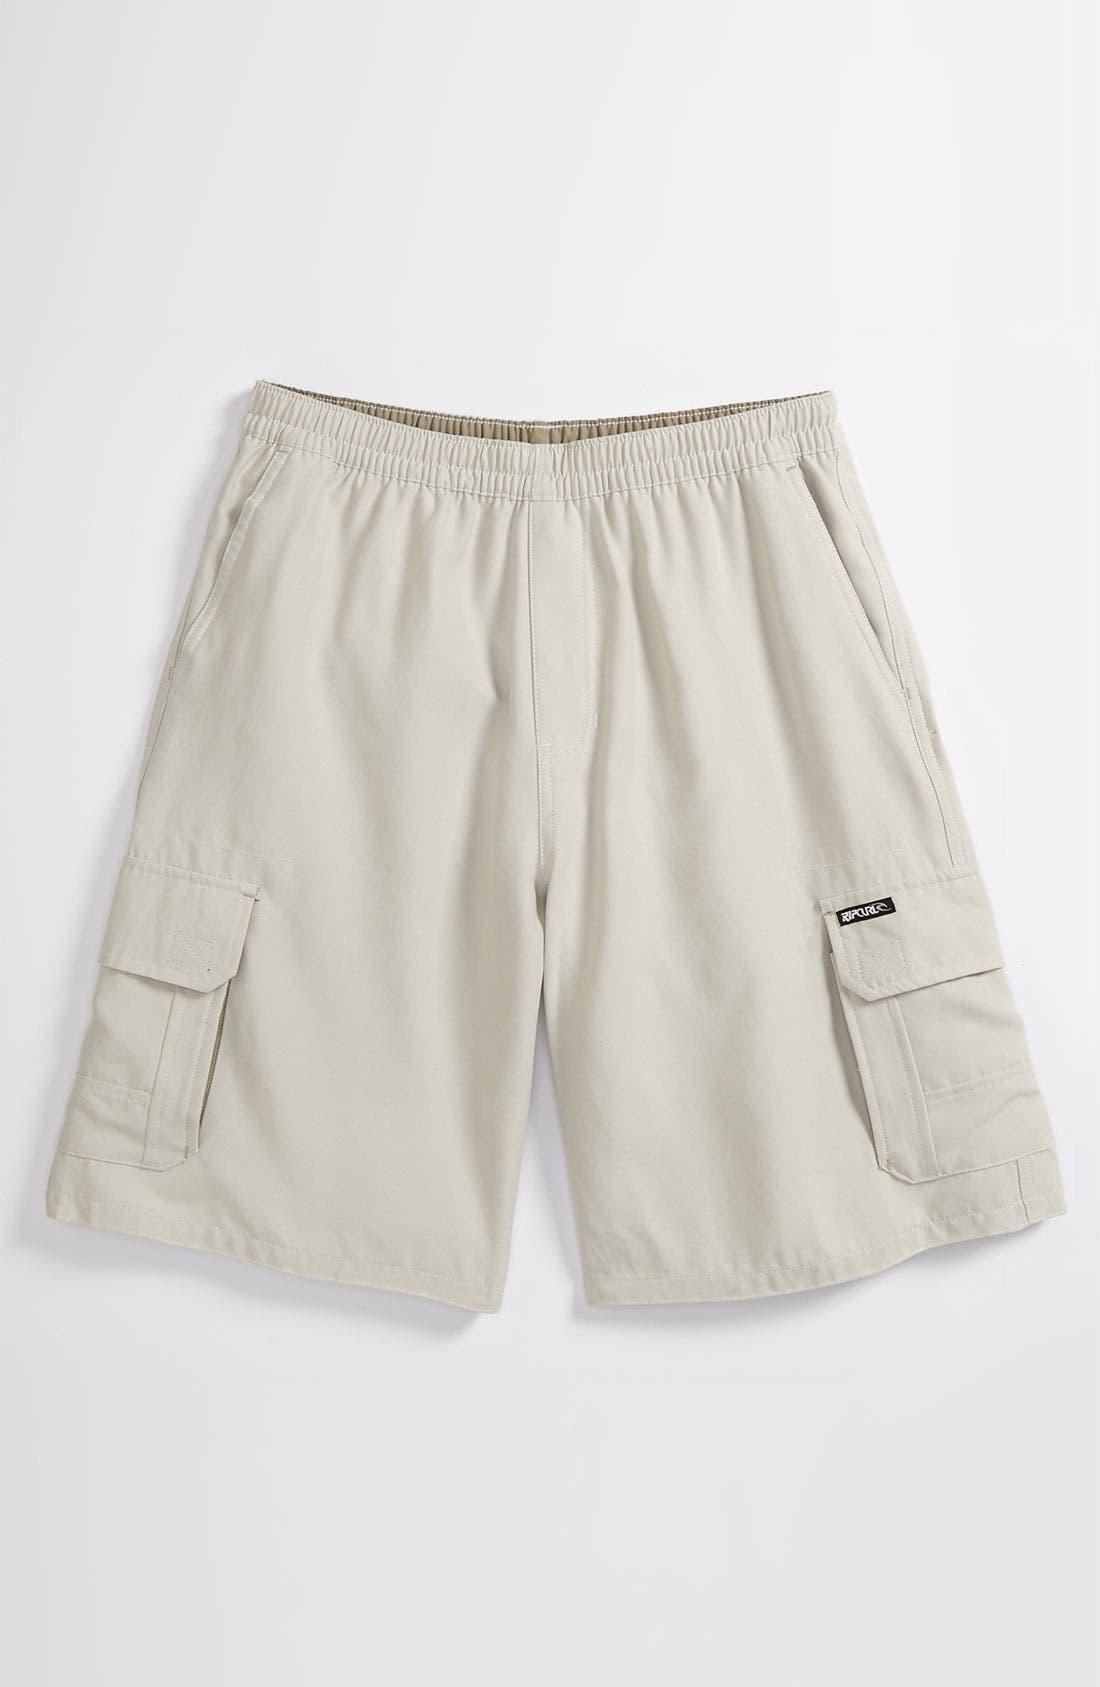 Alternate Image 1 Selected - Rip Curl 'Hamilton' Shorts (Little Boys)